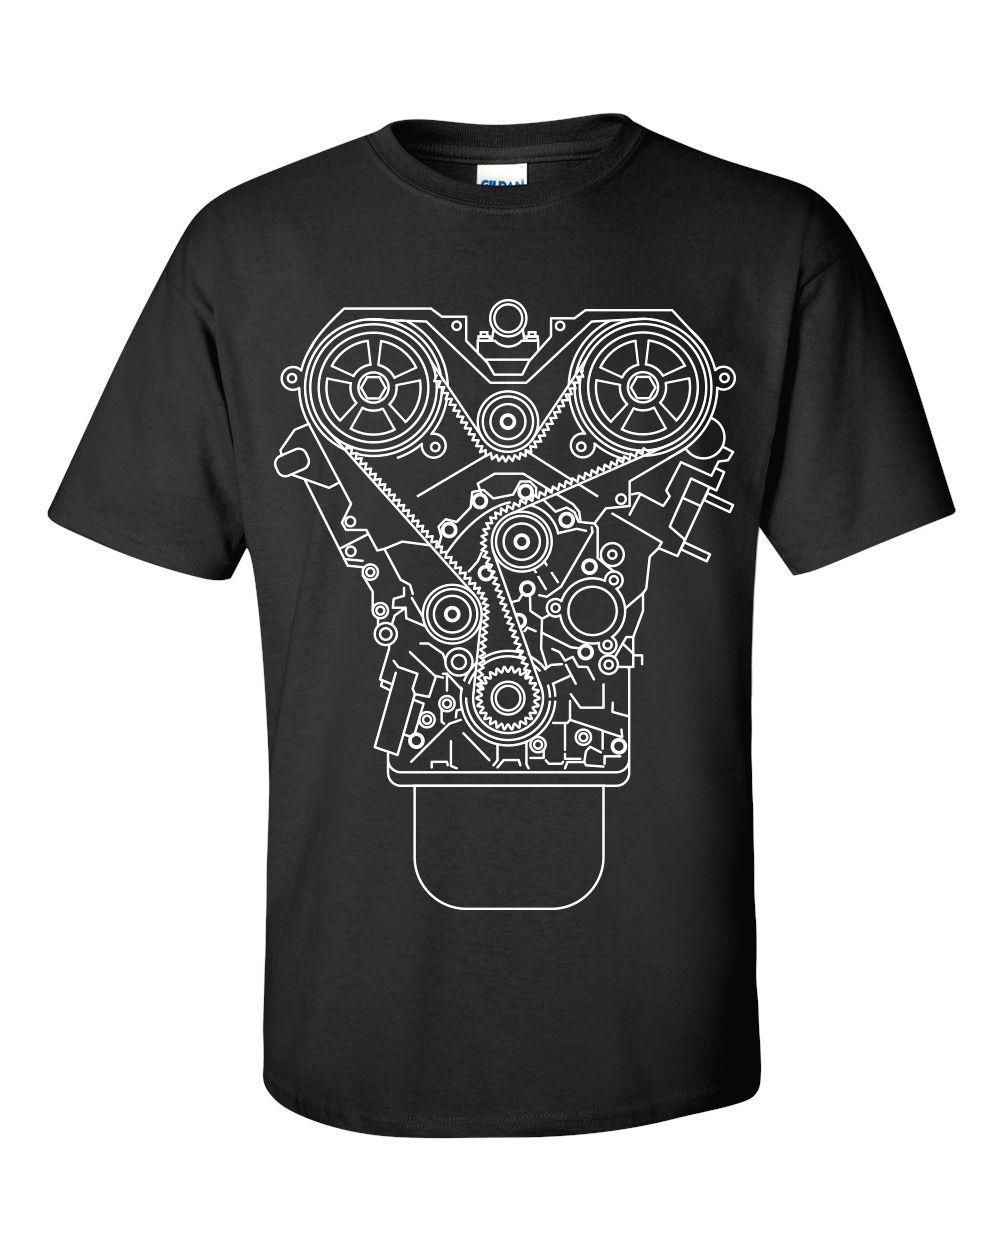 100% Cotton Brand New ENGINE DESIGN T-shirt Black S-3XL JDM Tuner Decal Mechanic Tool Garage Piston Summer Tee Shirt